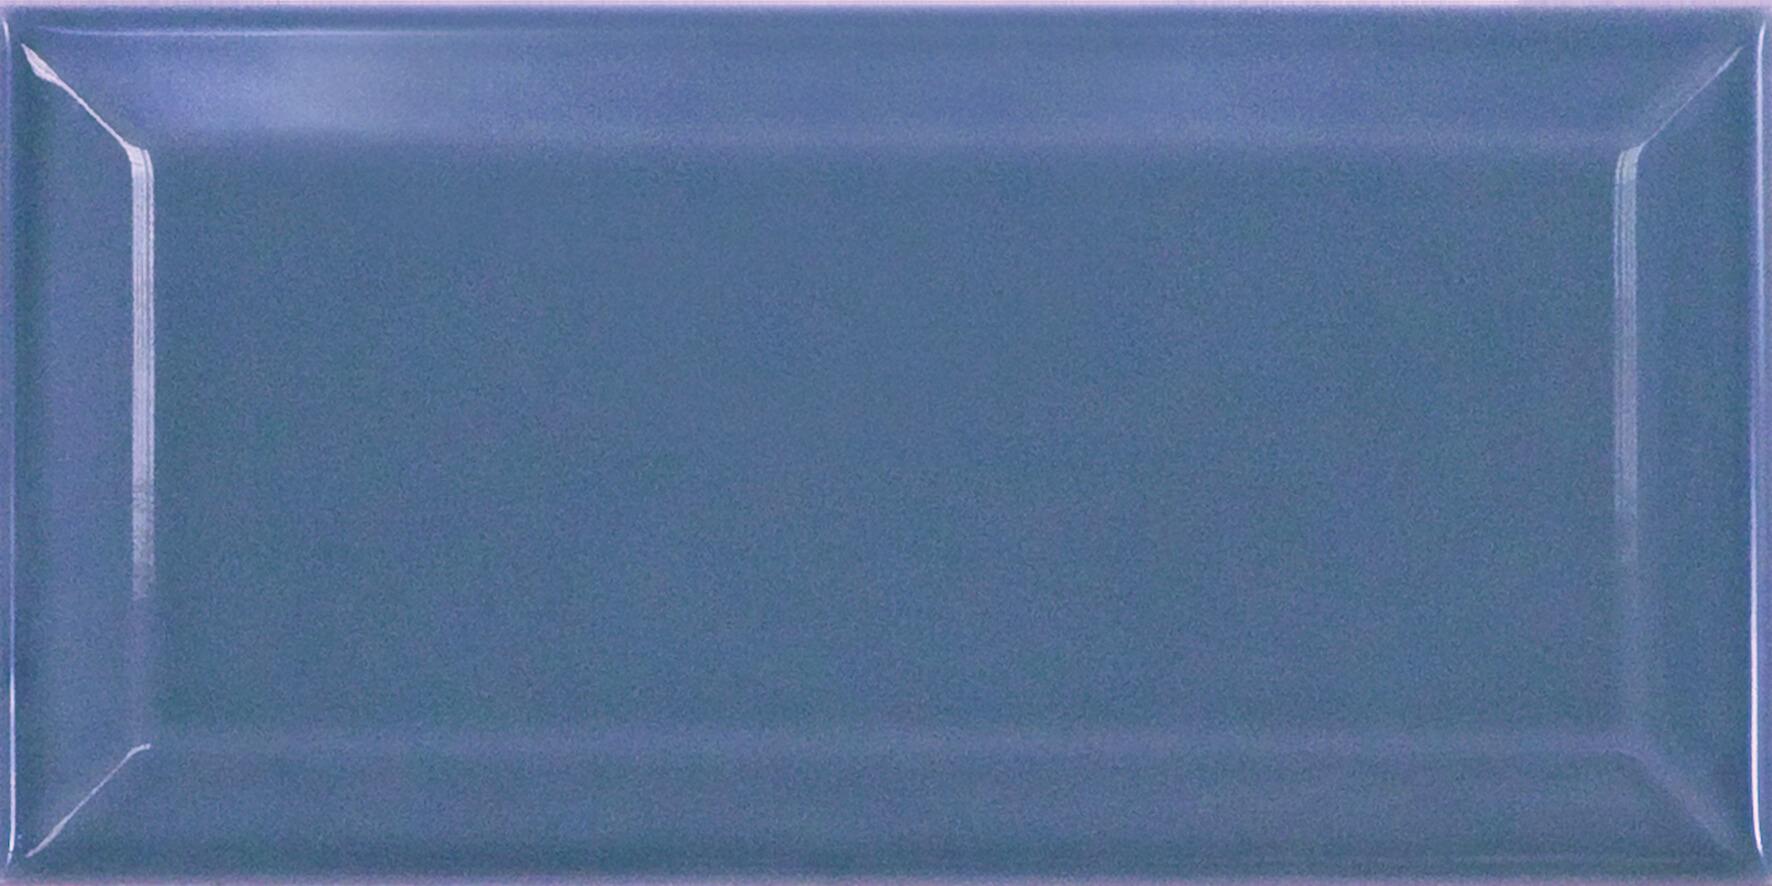 METRO BLUE 7.5X15